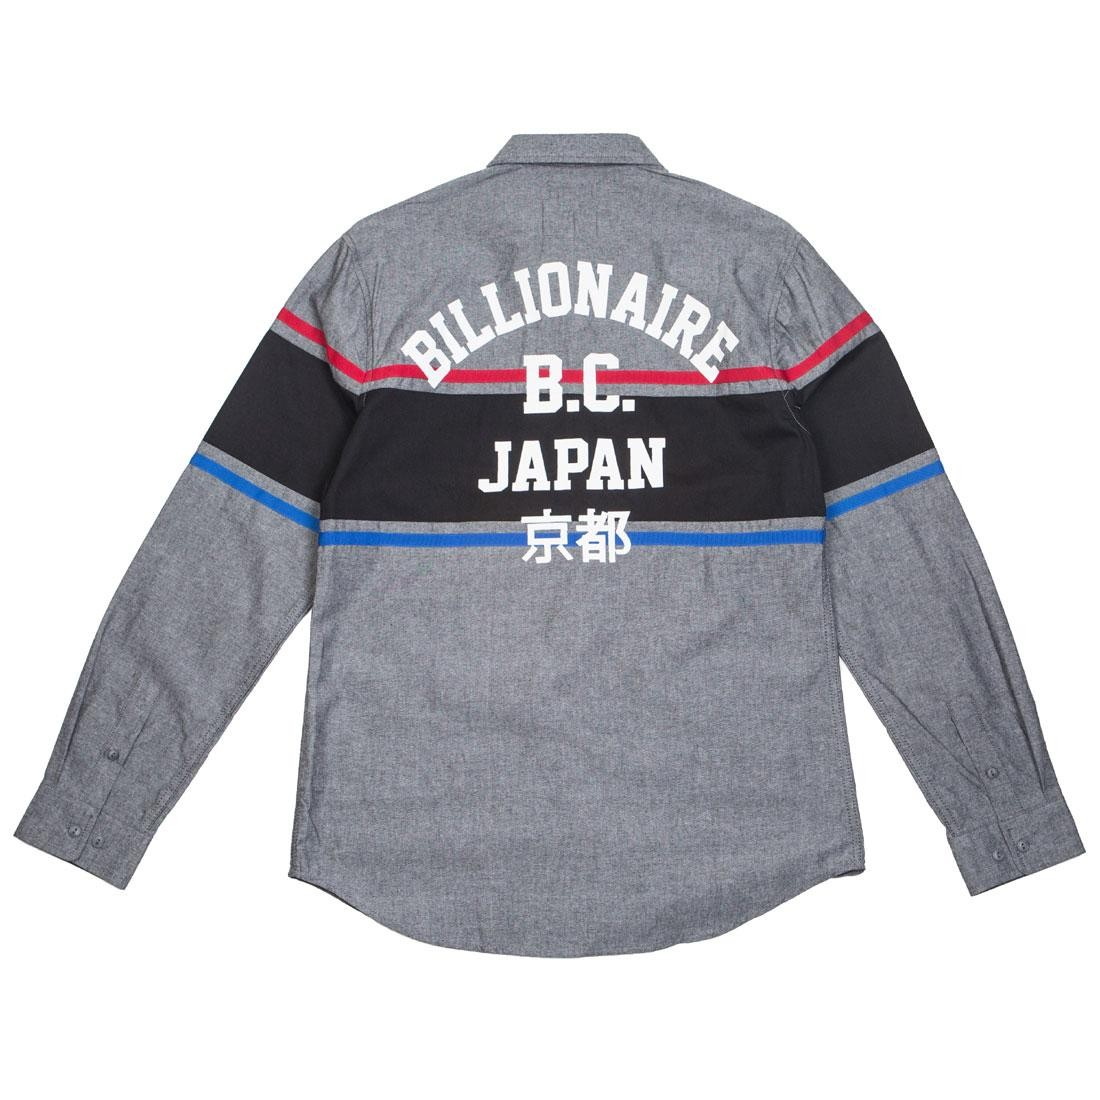 Billionaire Boys Club Men Service Bay Long Sleeve Woven Shirt (gray / chambray)